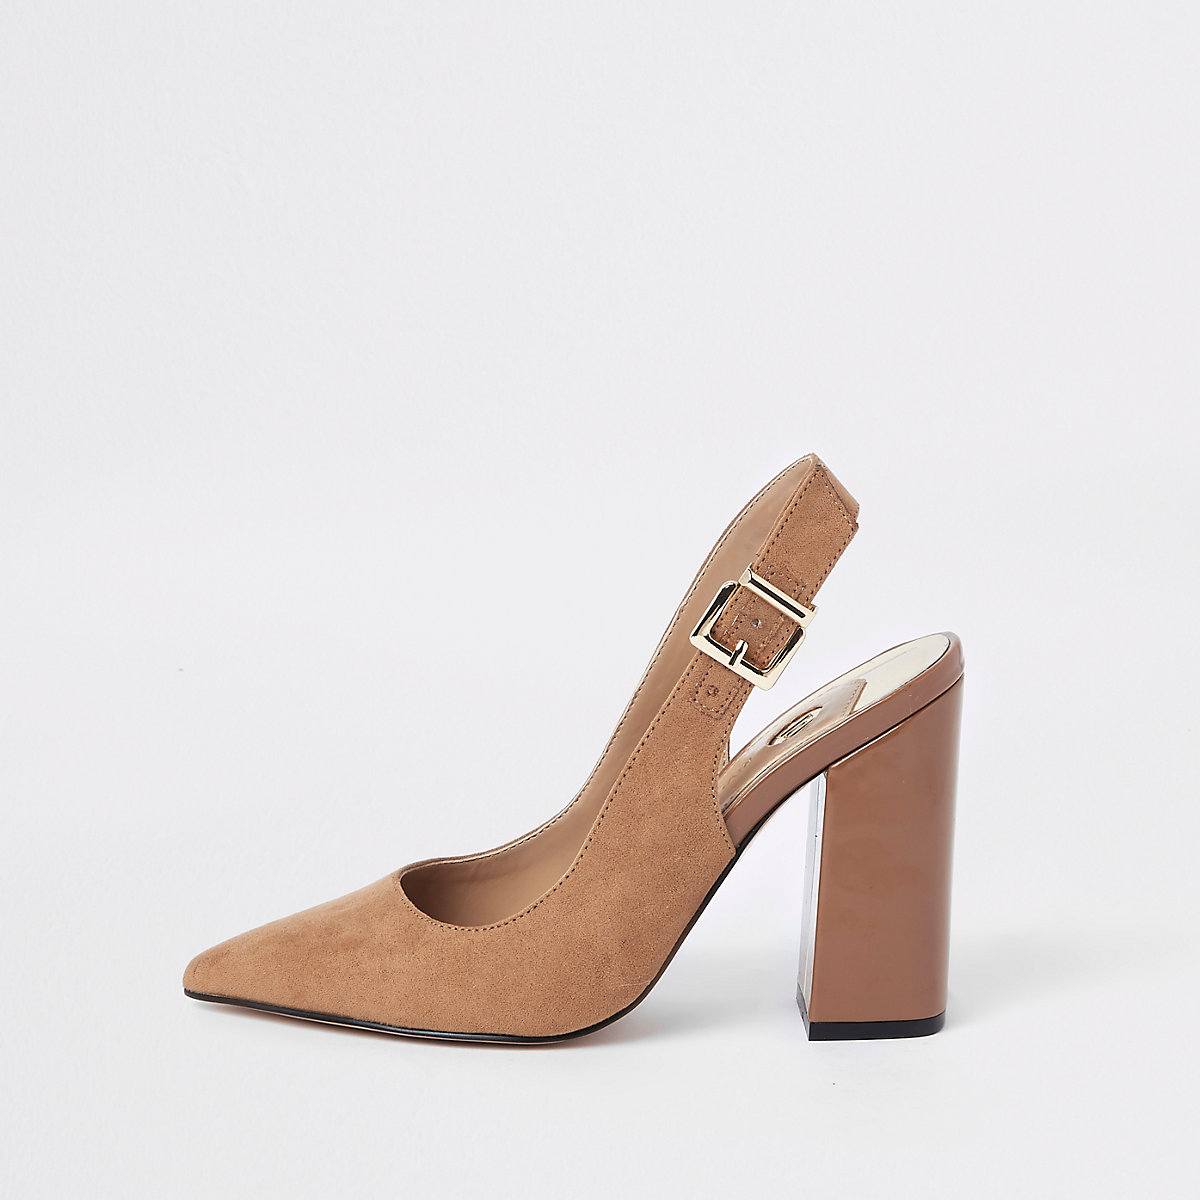 Dark brown block heel sling back court shoes